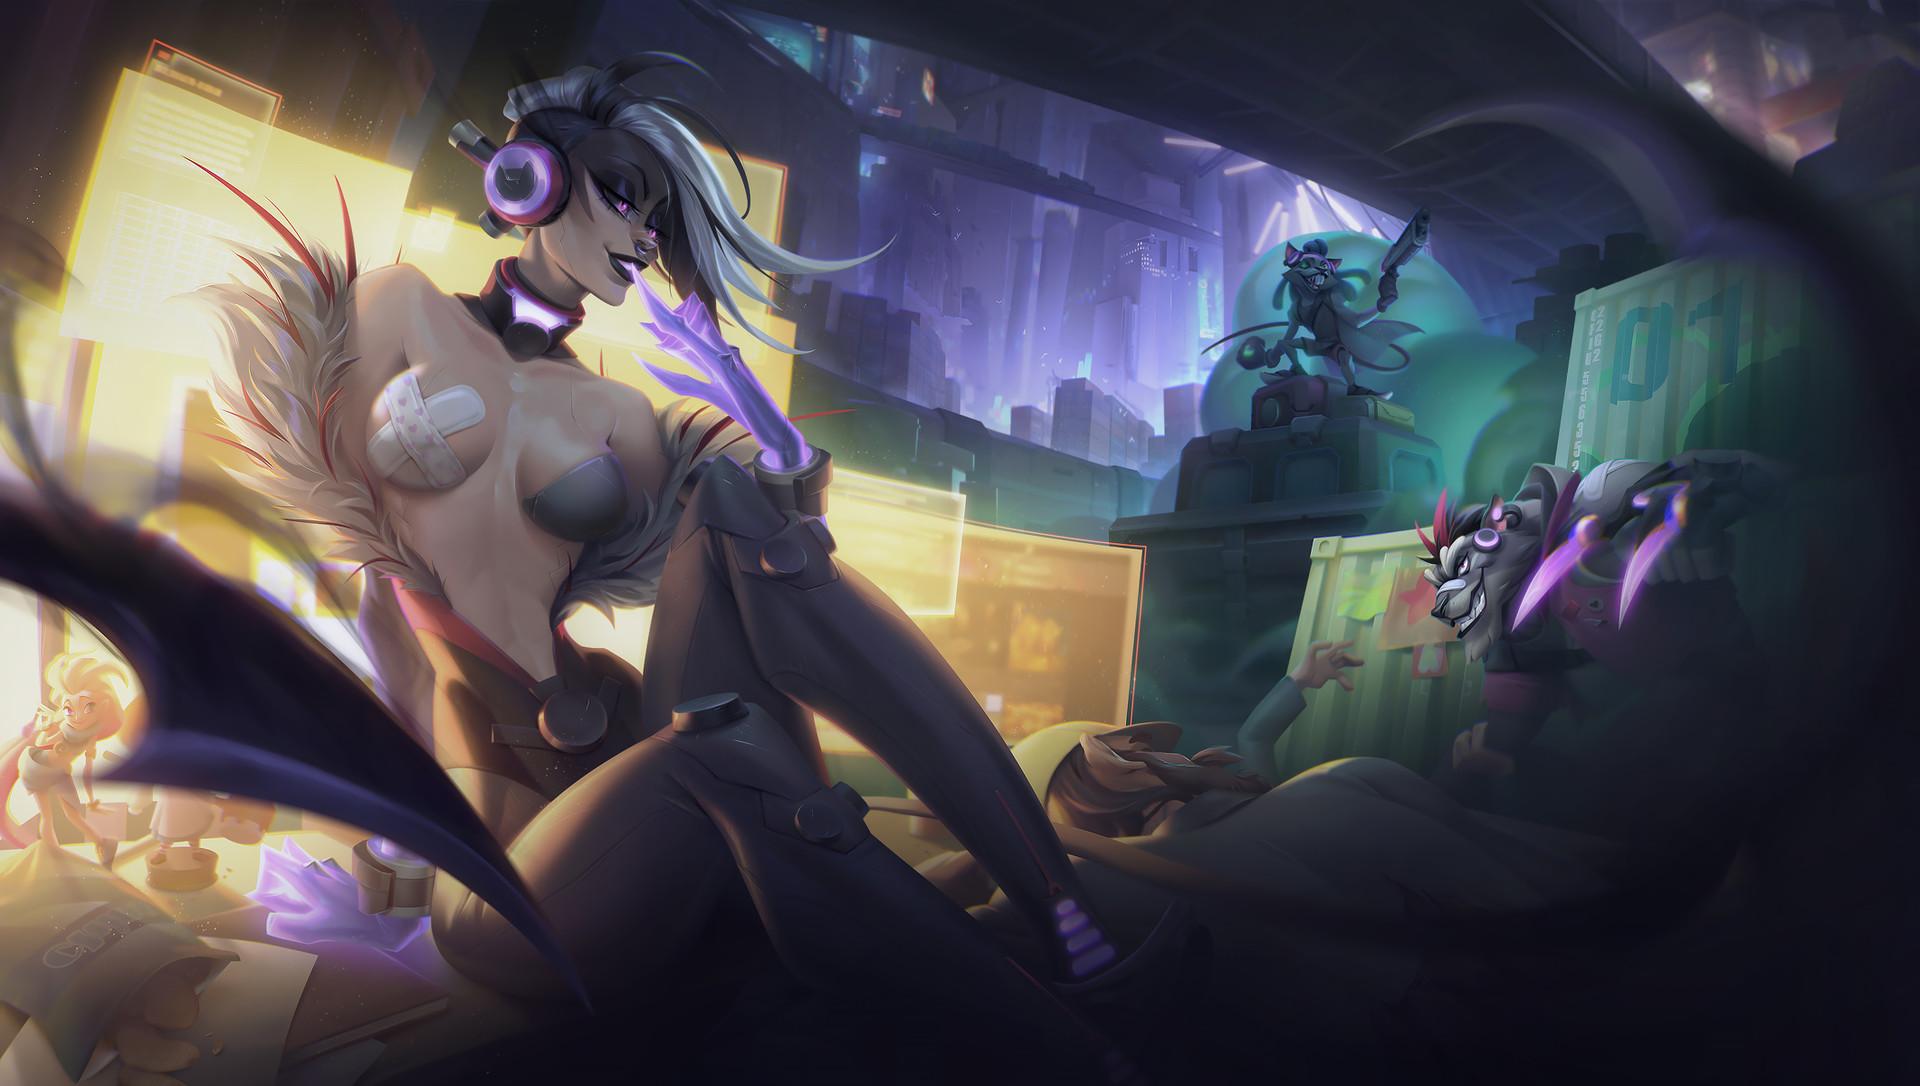 Lol Champions Wallpaper Hd Mercenaries Evelynn Twitch And Rengar Fanart By Sasha